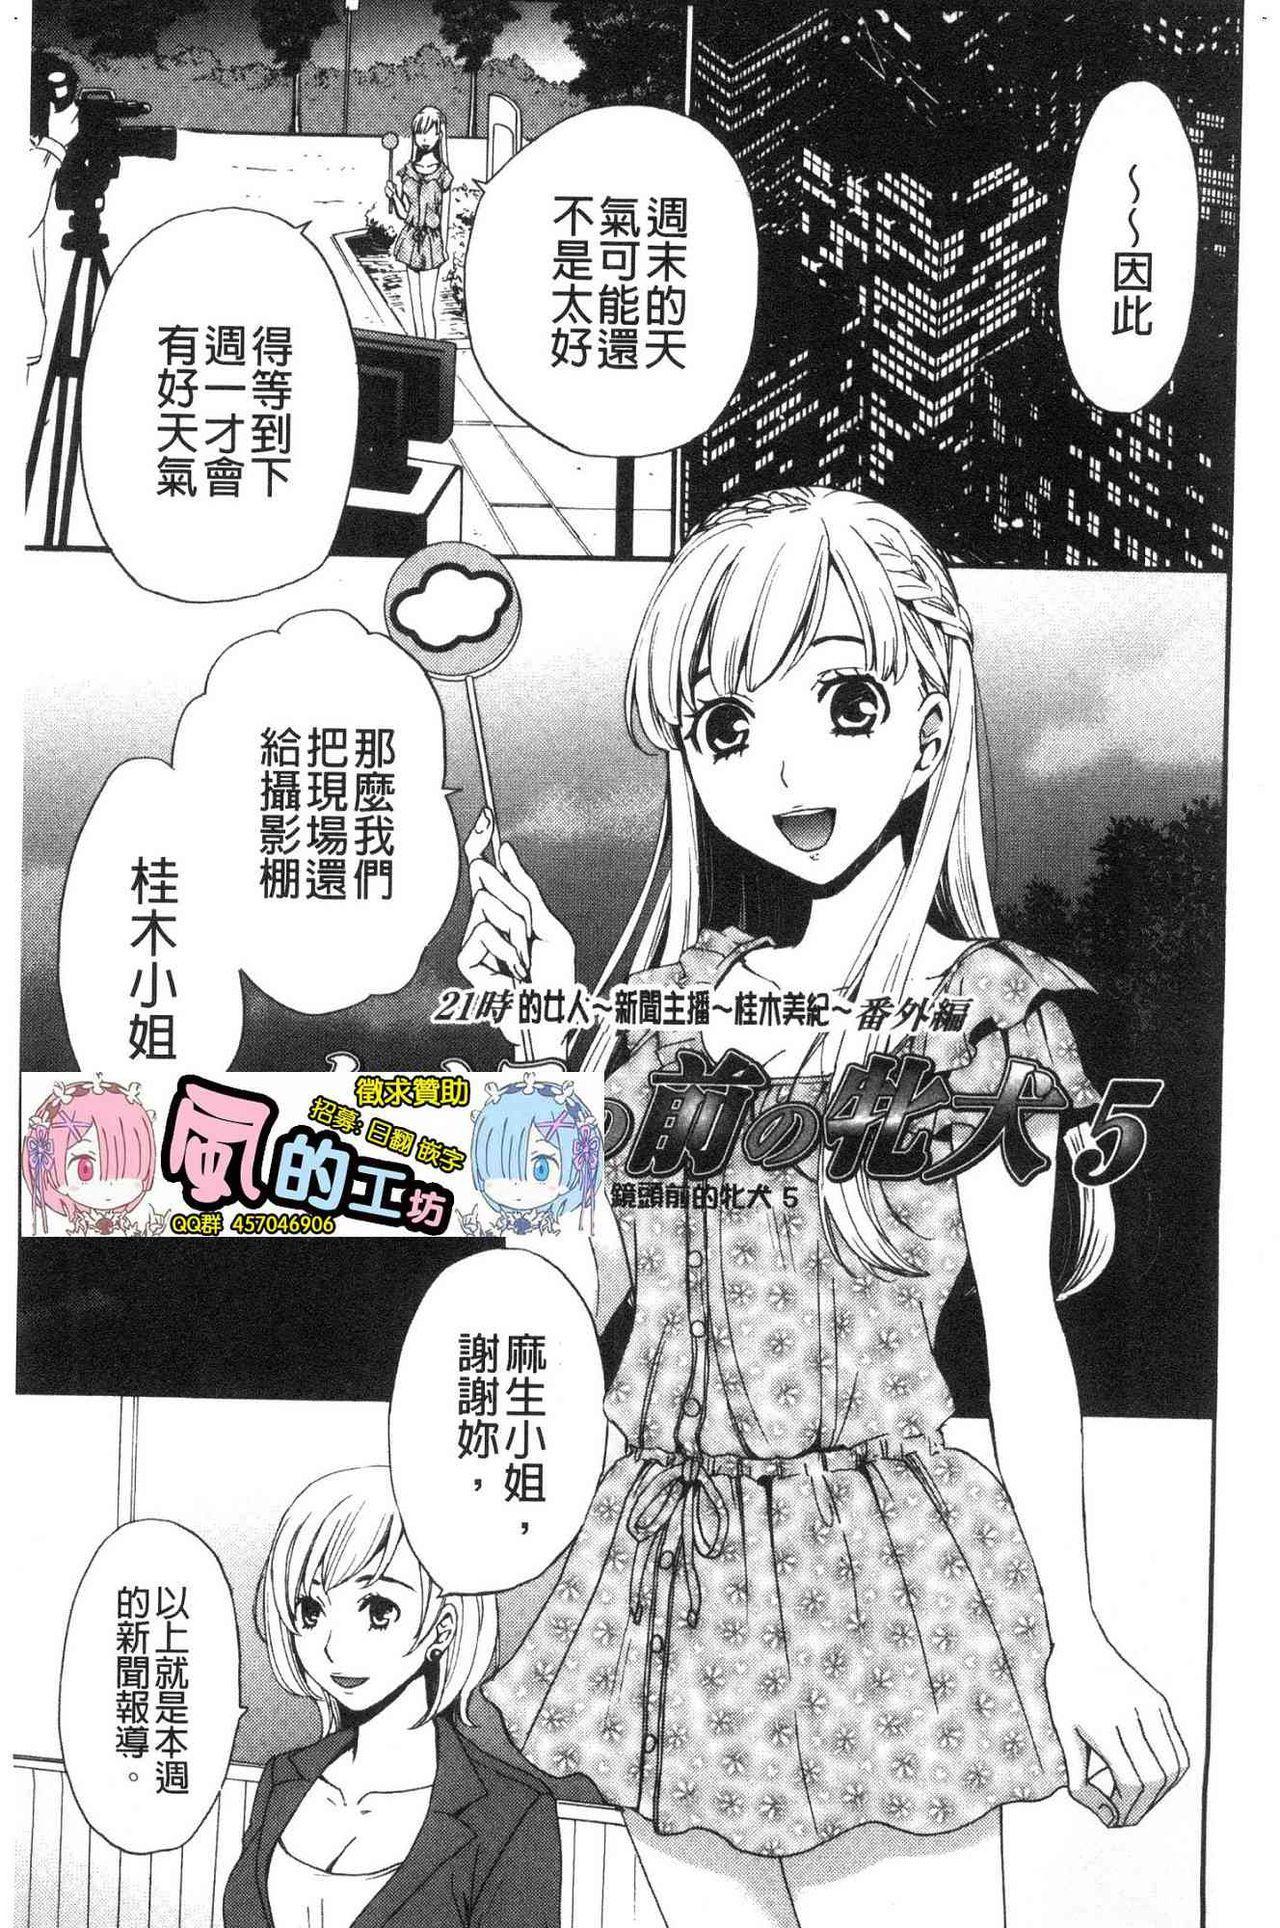 [Gotoh Akira]  21-ji no Onna ~Camera no Mae no Mesuinu~ 2 | 21時之女 ~鏡頭前的牝犬~ 2 [Chinese] 4